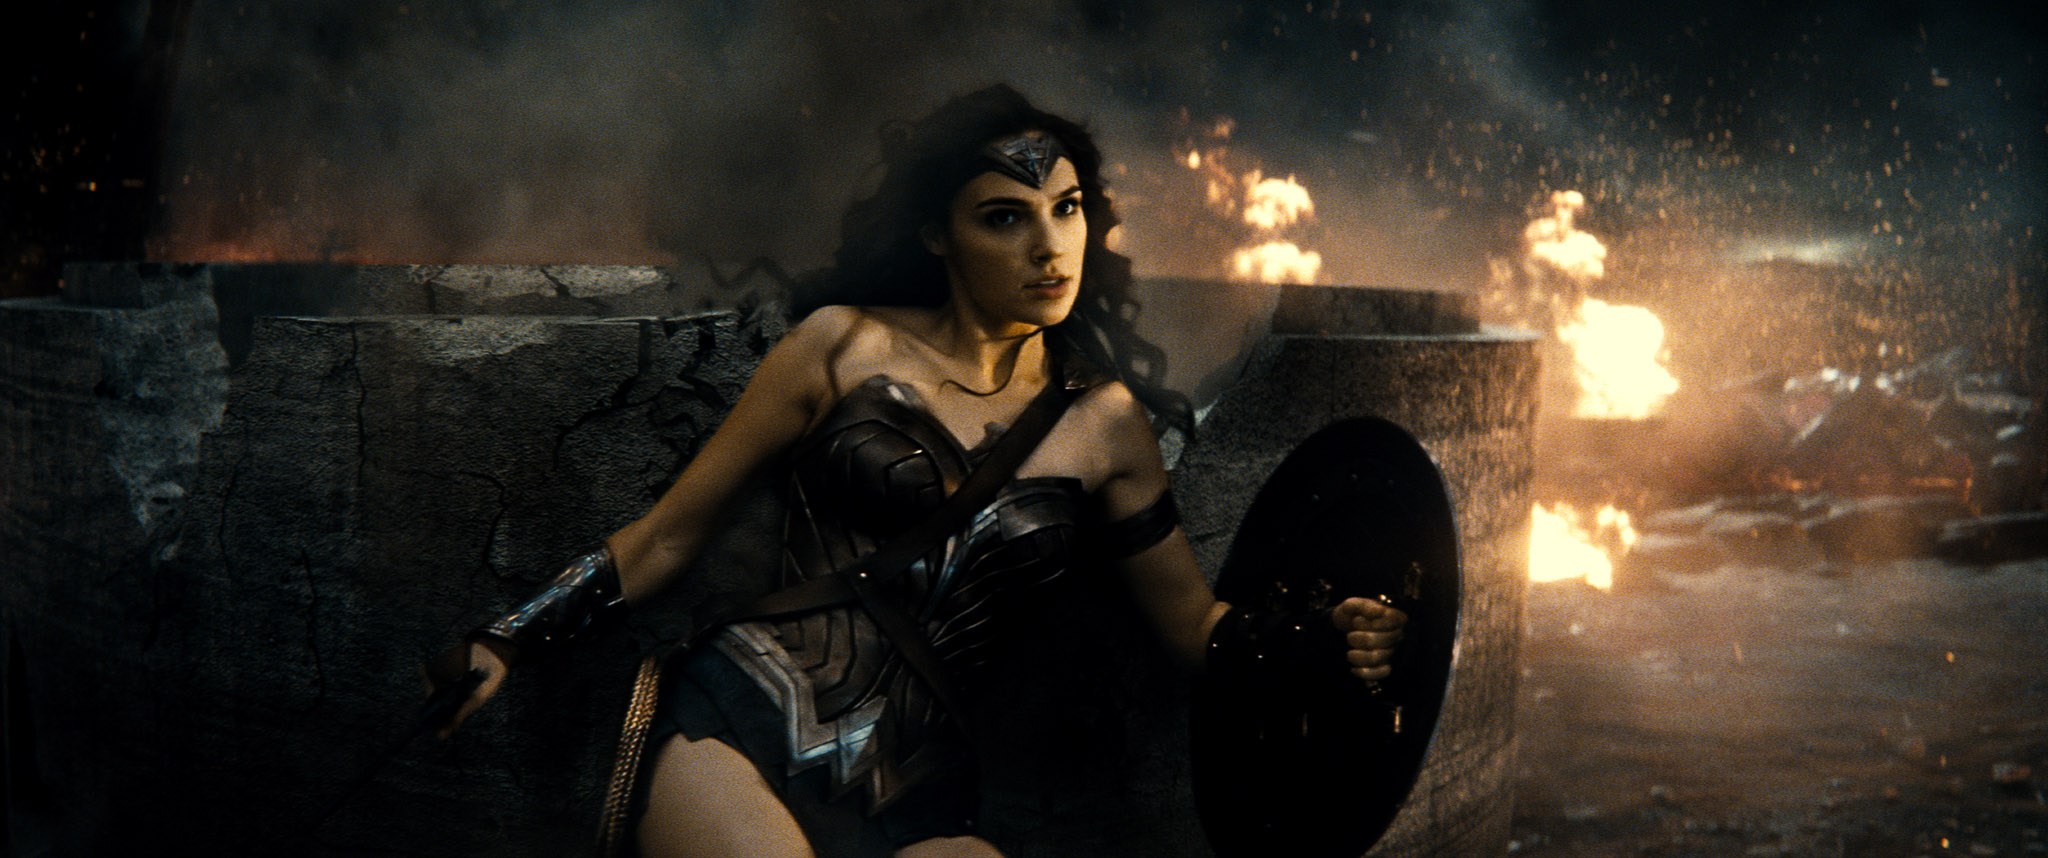 Gal Gadot Images Wonder Woman Hd Wallpaper And Background Photos